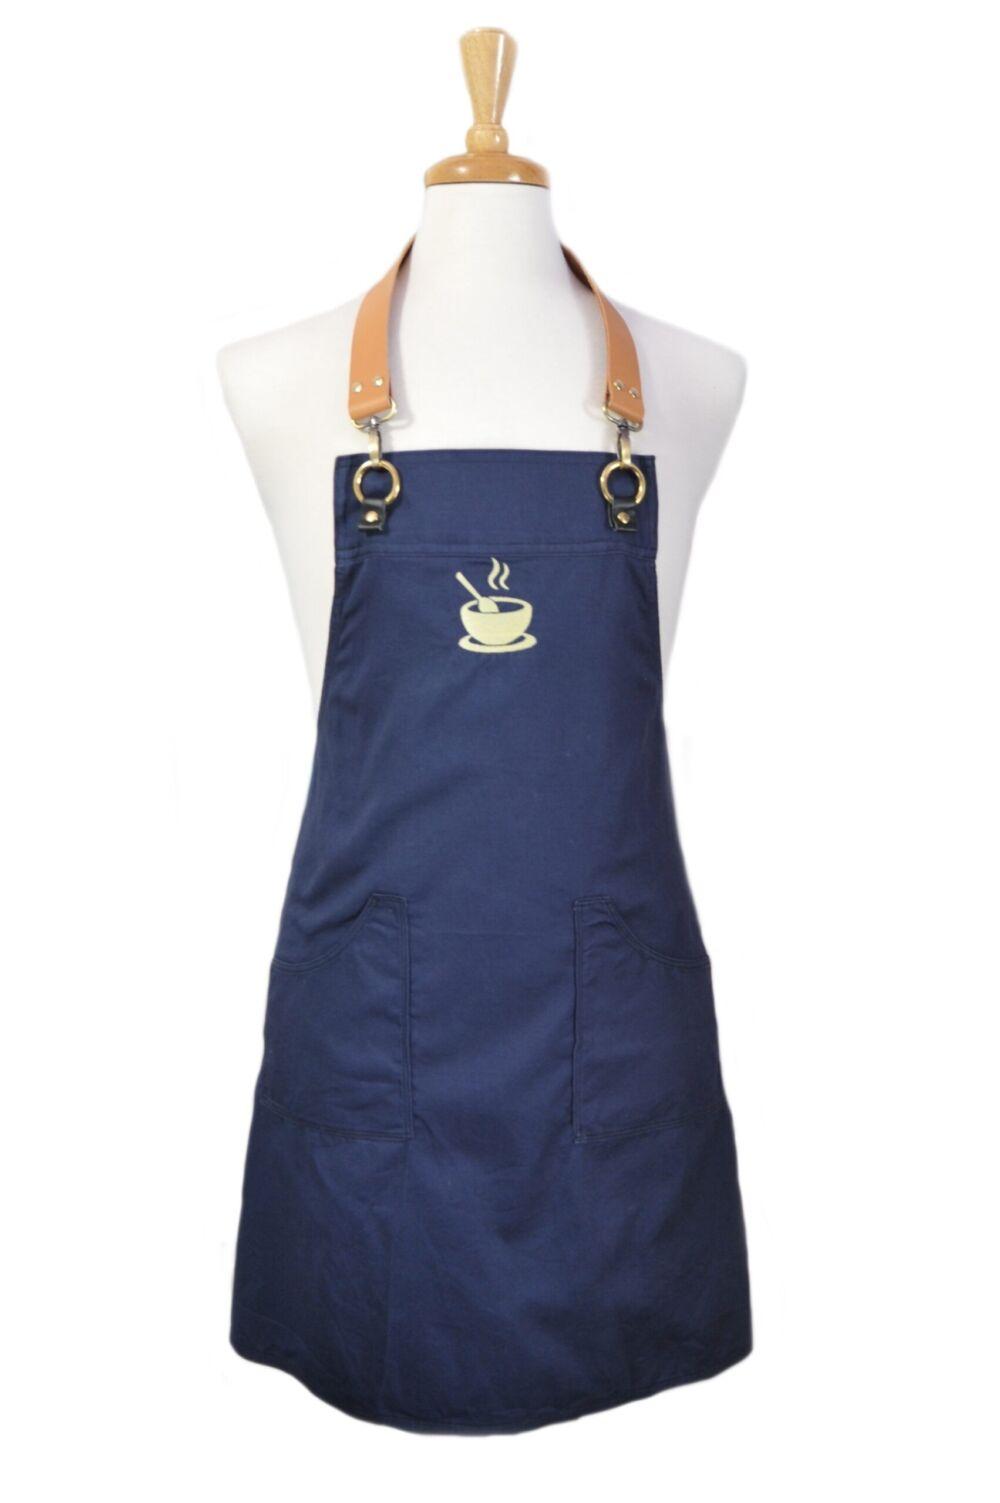 Custom-made apron